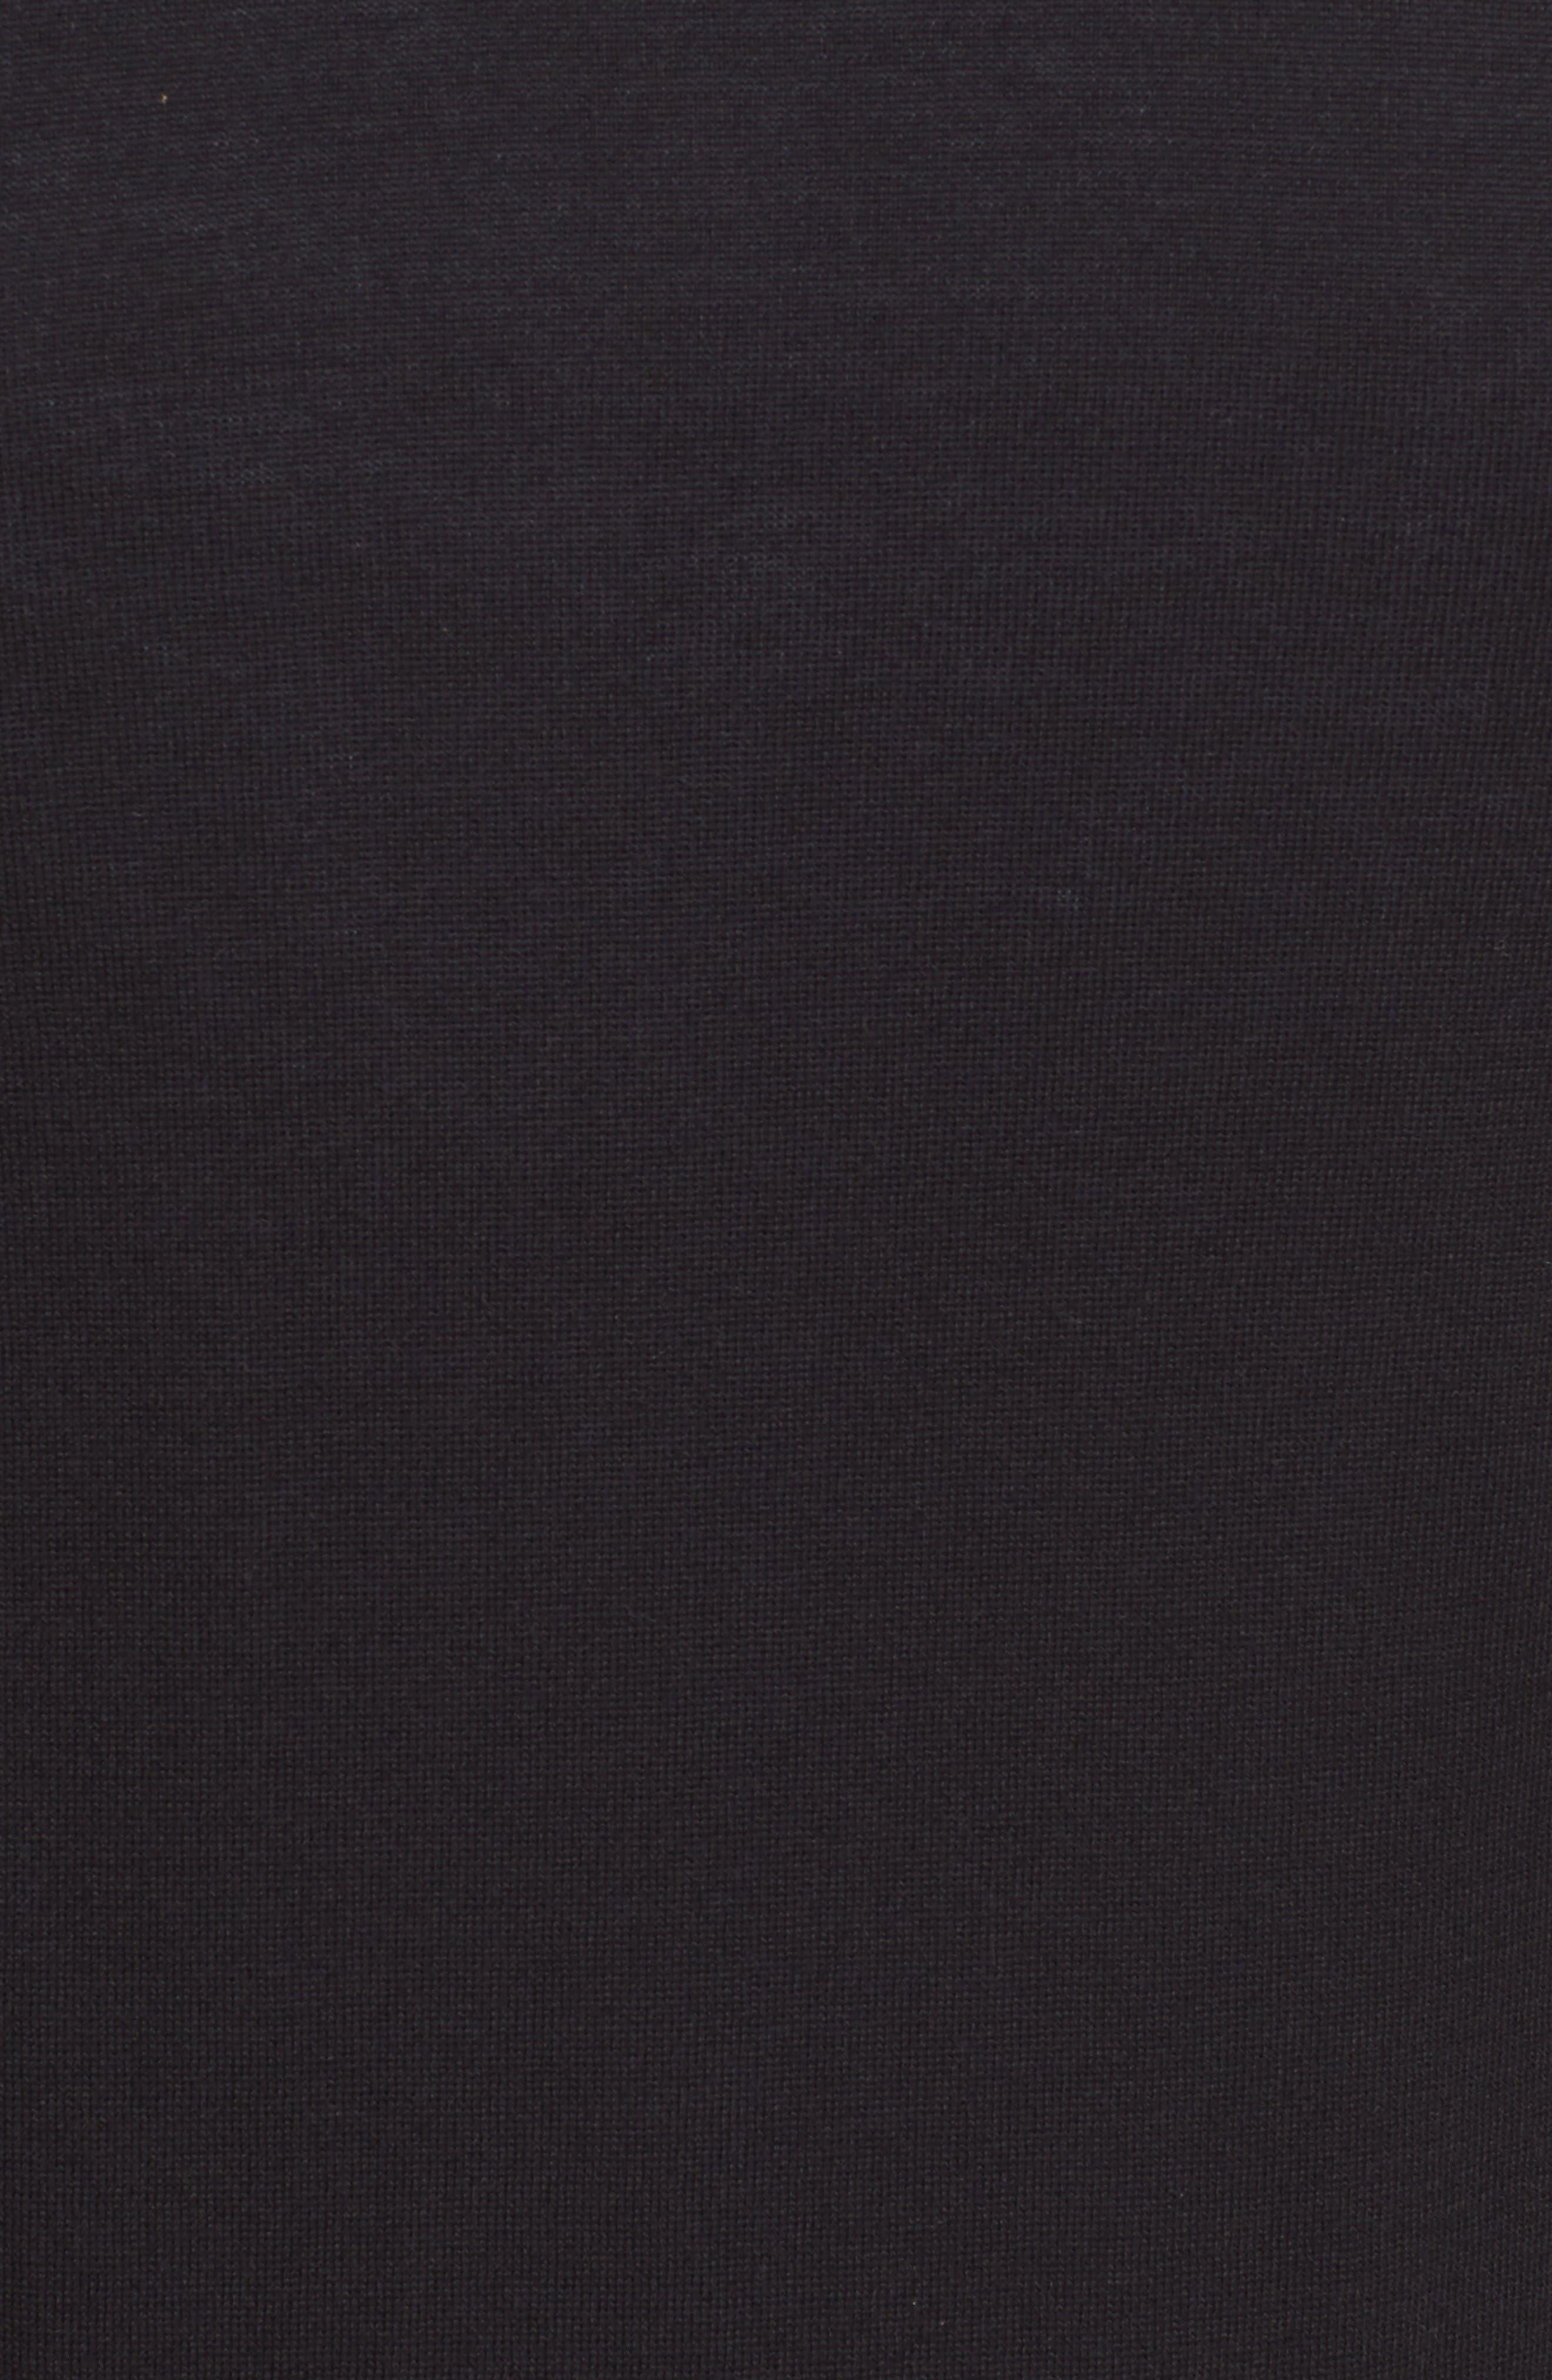 Comme des Garçons PLAY Heart Logo Cardigan,                             Alternate thumbnail 5, color,                             Black